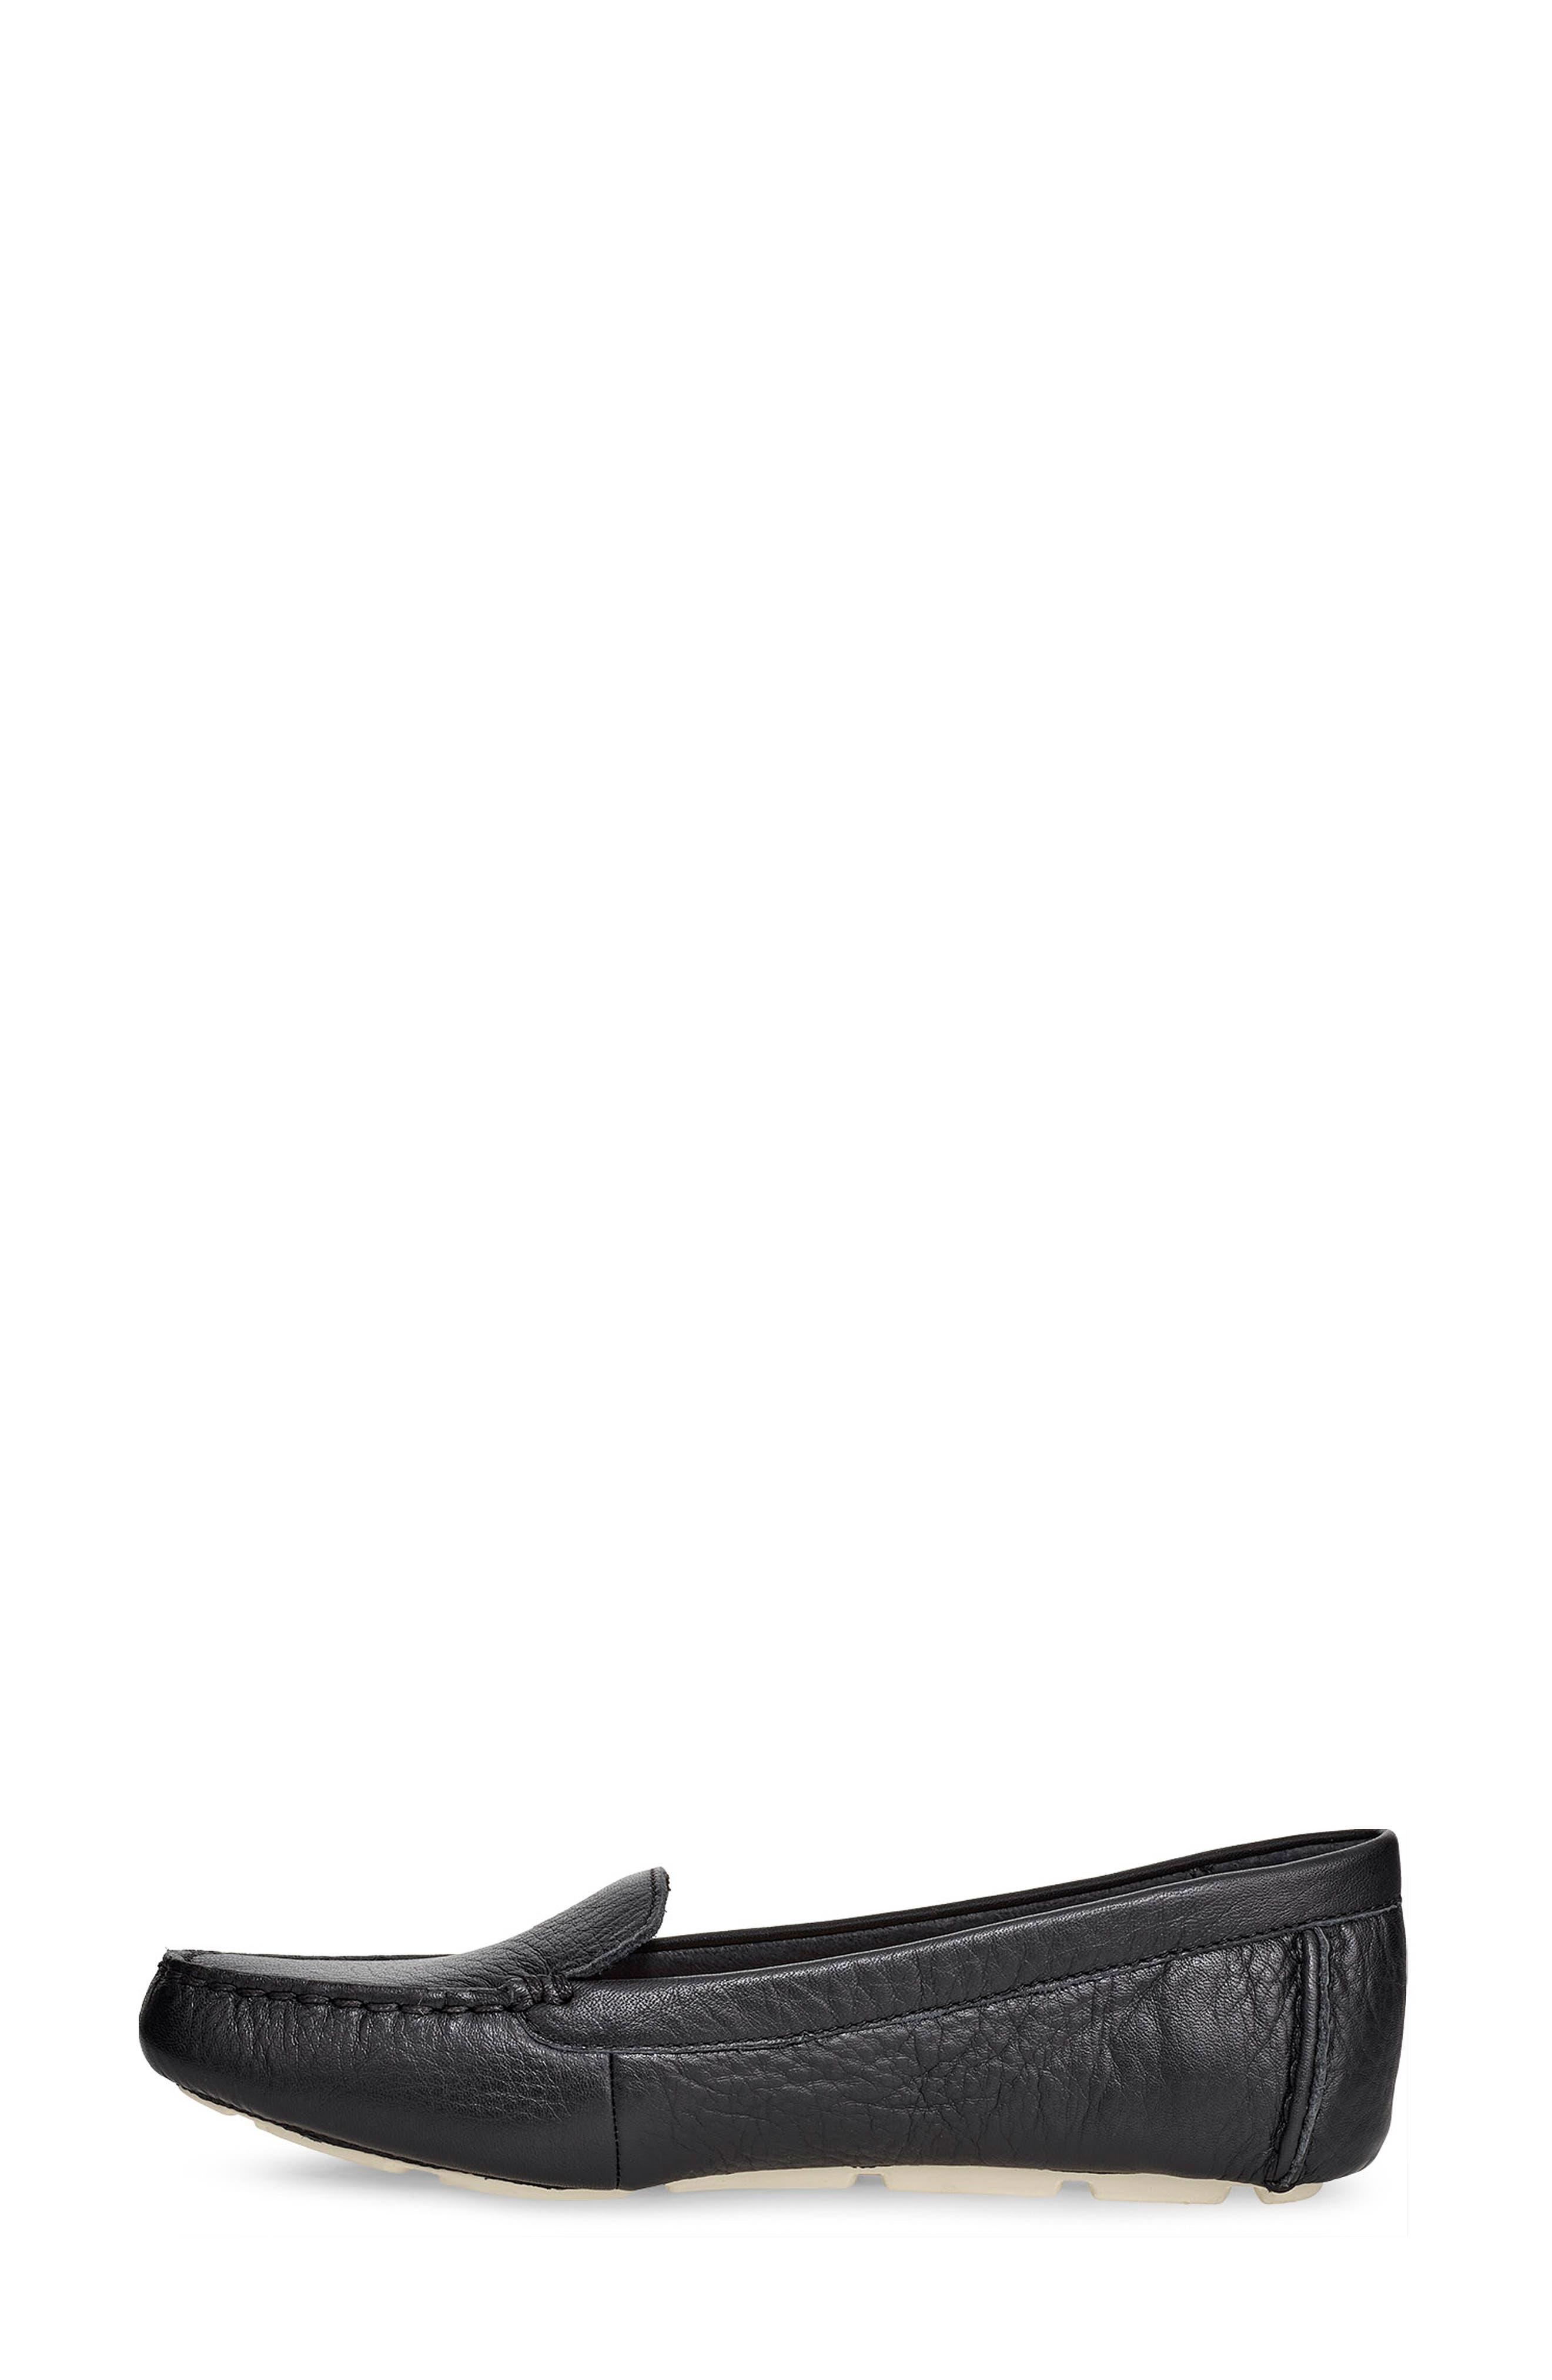 Flores Driving Loafer,                             Alternate thumbnail 6, color,                             BLACK LEATHER